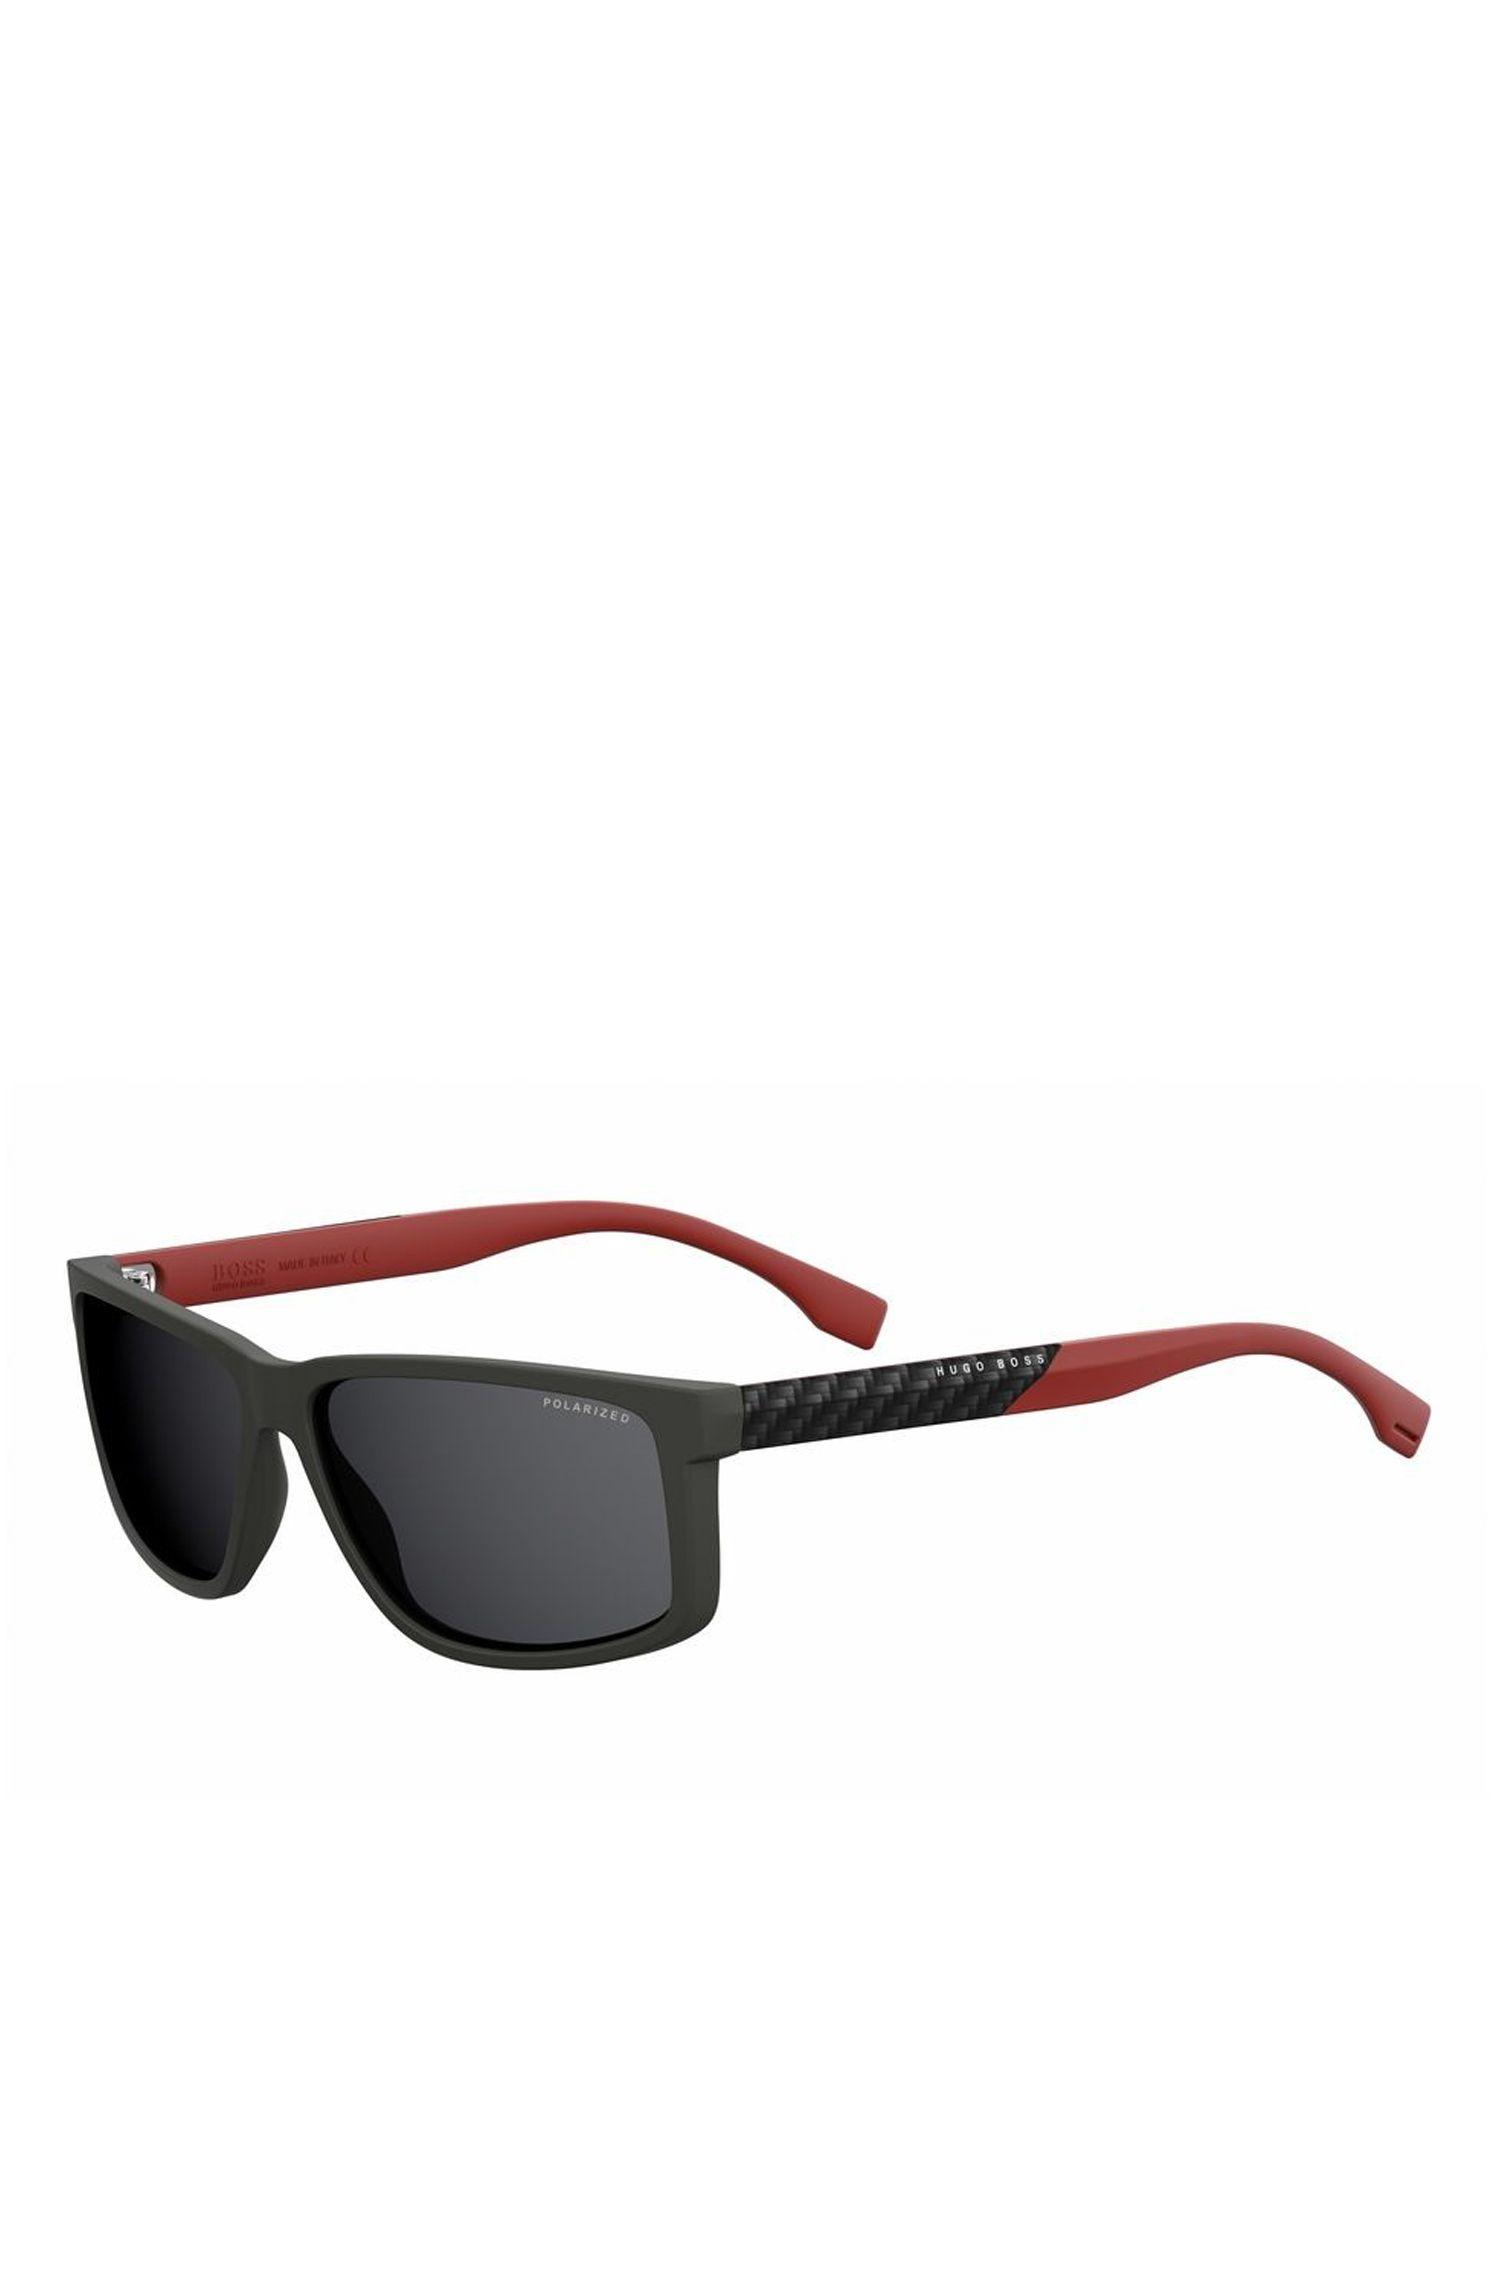 Rectangular Black Lens Carbon Fiber Sunglasses | BOSS 0833S, Assorted-Pre-Pack